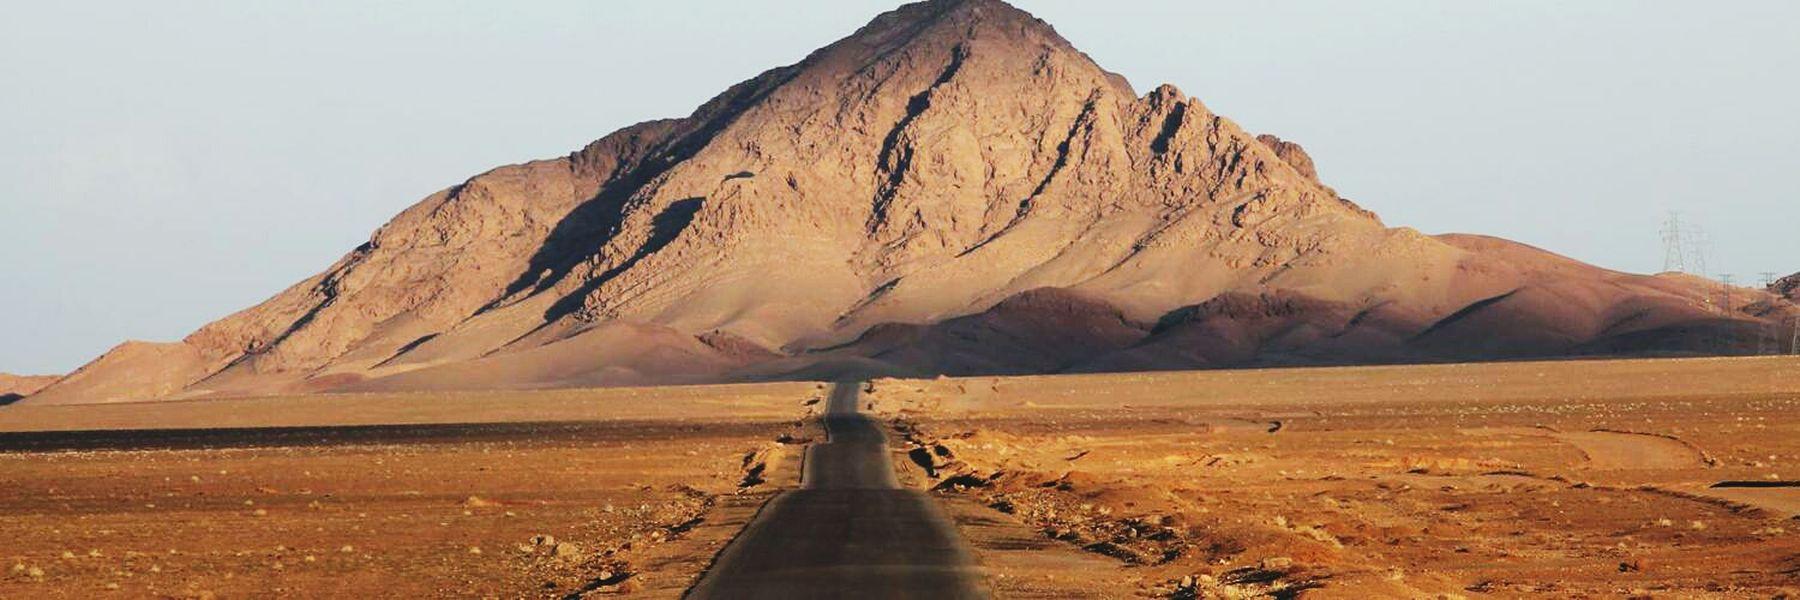 Here is not mexico !!! Here is Afganistan Here Belongs To Me Herat Afghanistan Maountain Onewayroad